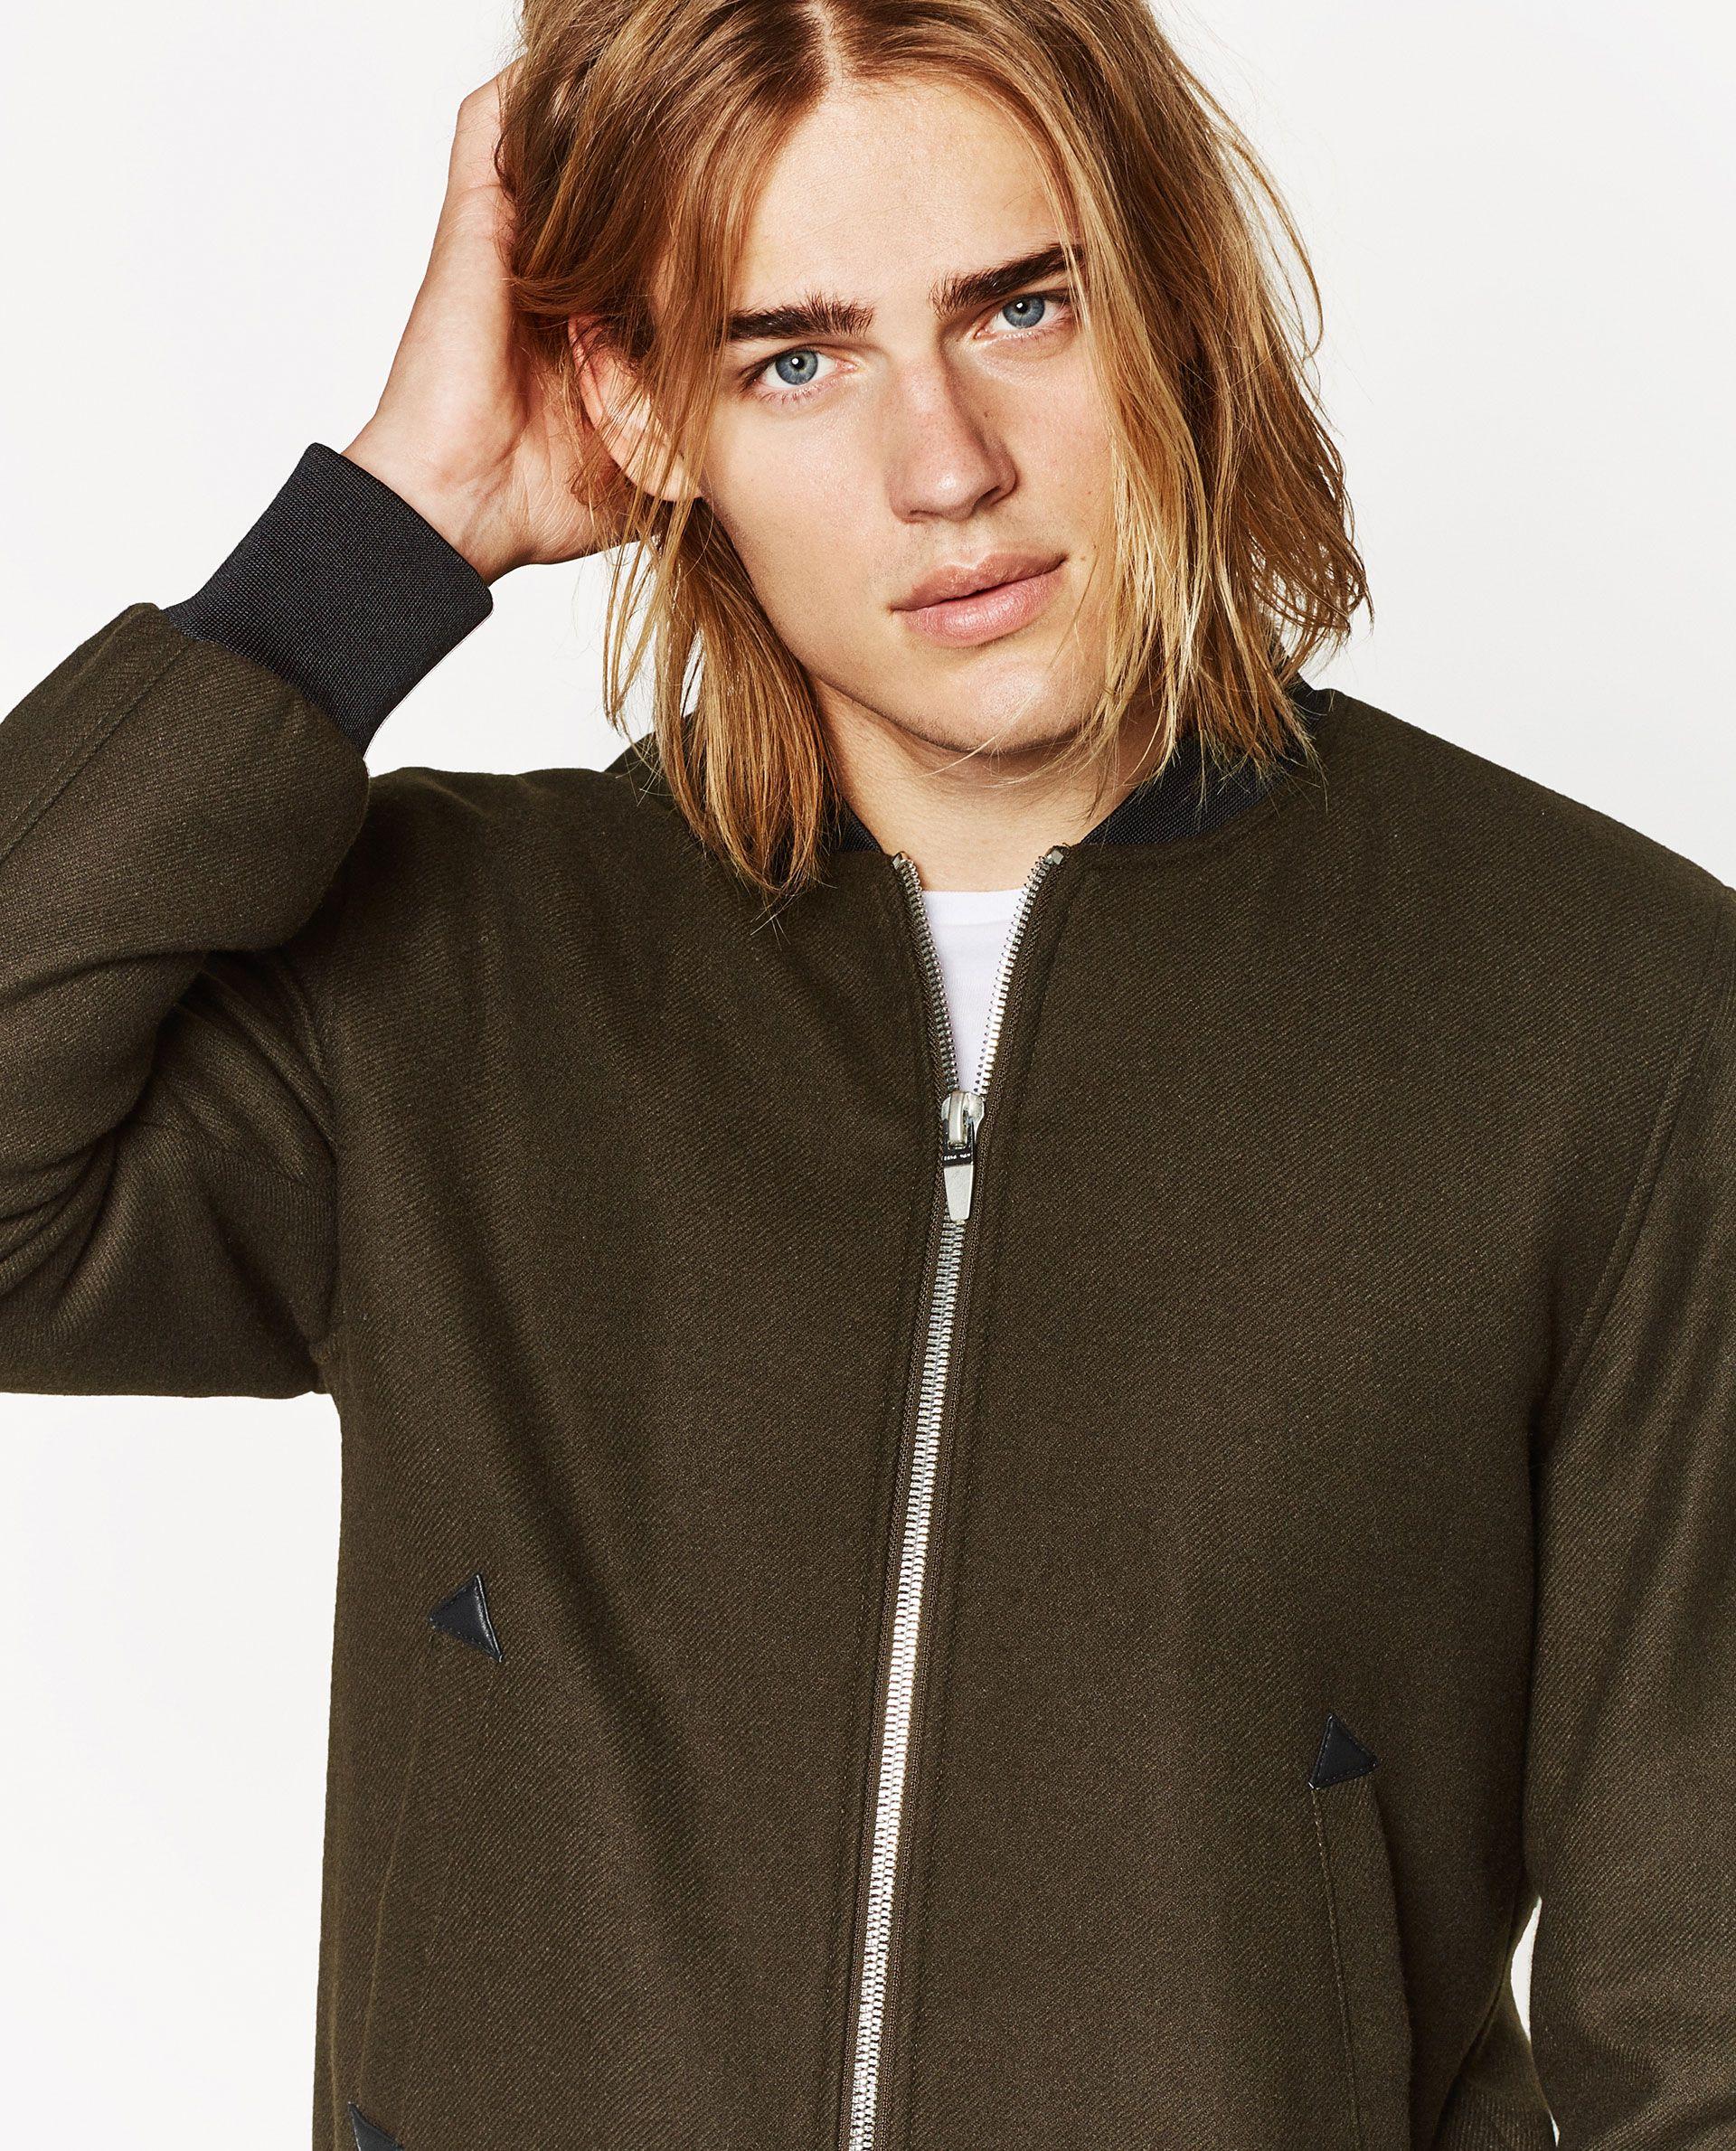 Cloth Bomber Jacket Zara Ton Heukels Male Model Long Hair